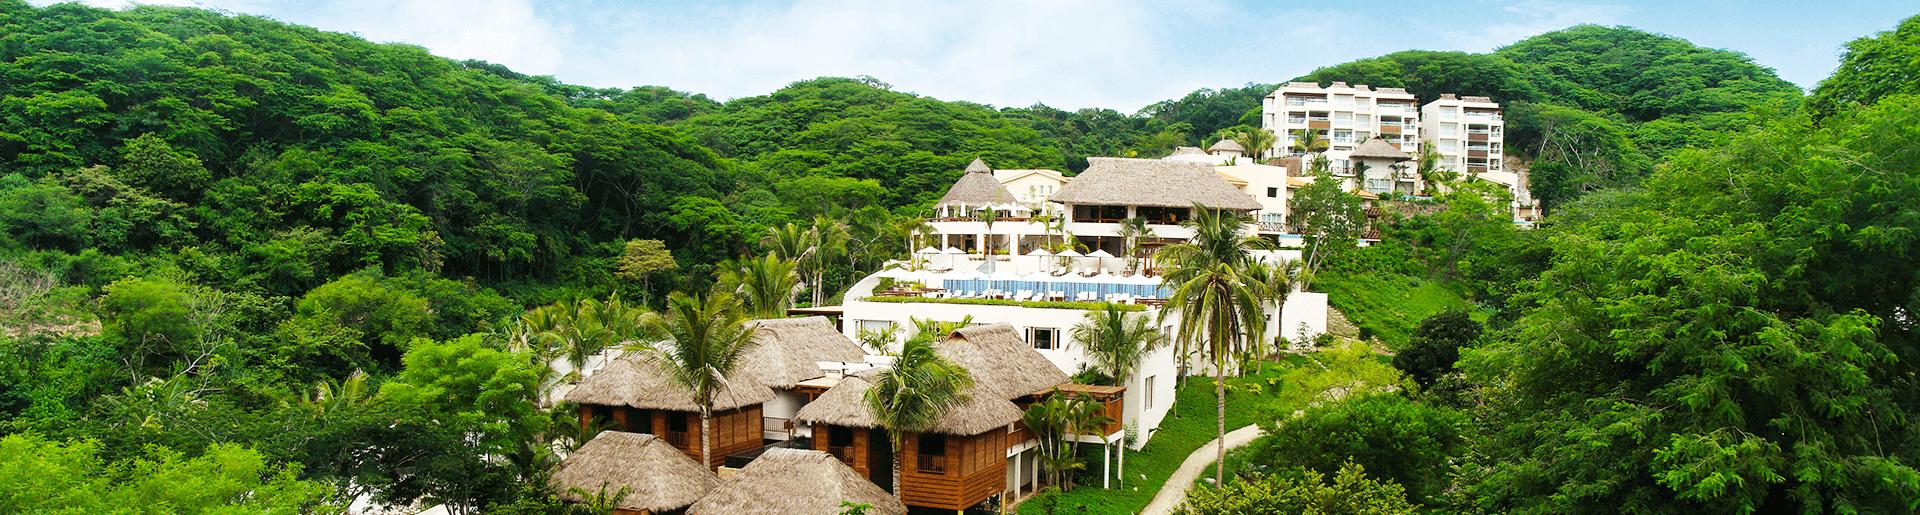 Sirenis destino turistico con excelente vista panoramica verde